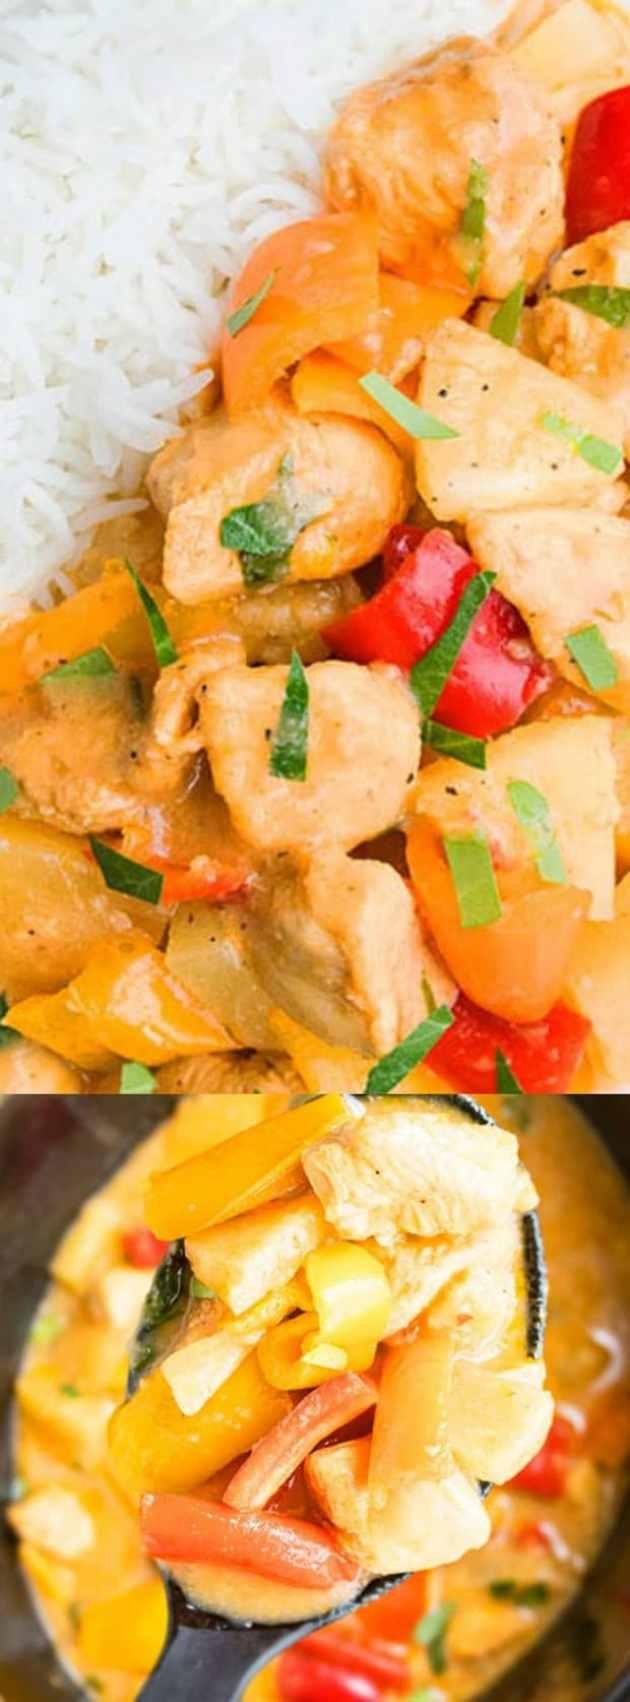 Slow Cooker Pineapple Chicken longpin